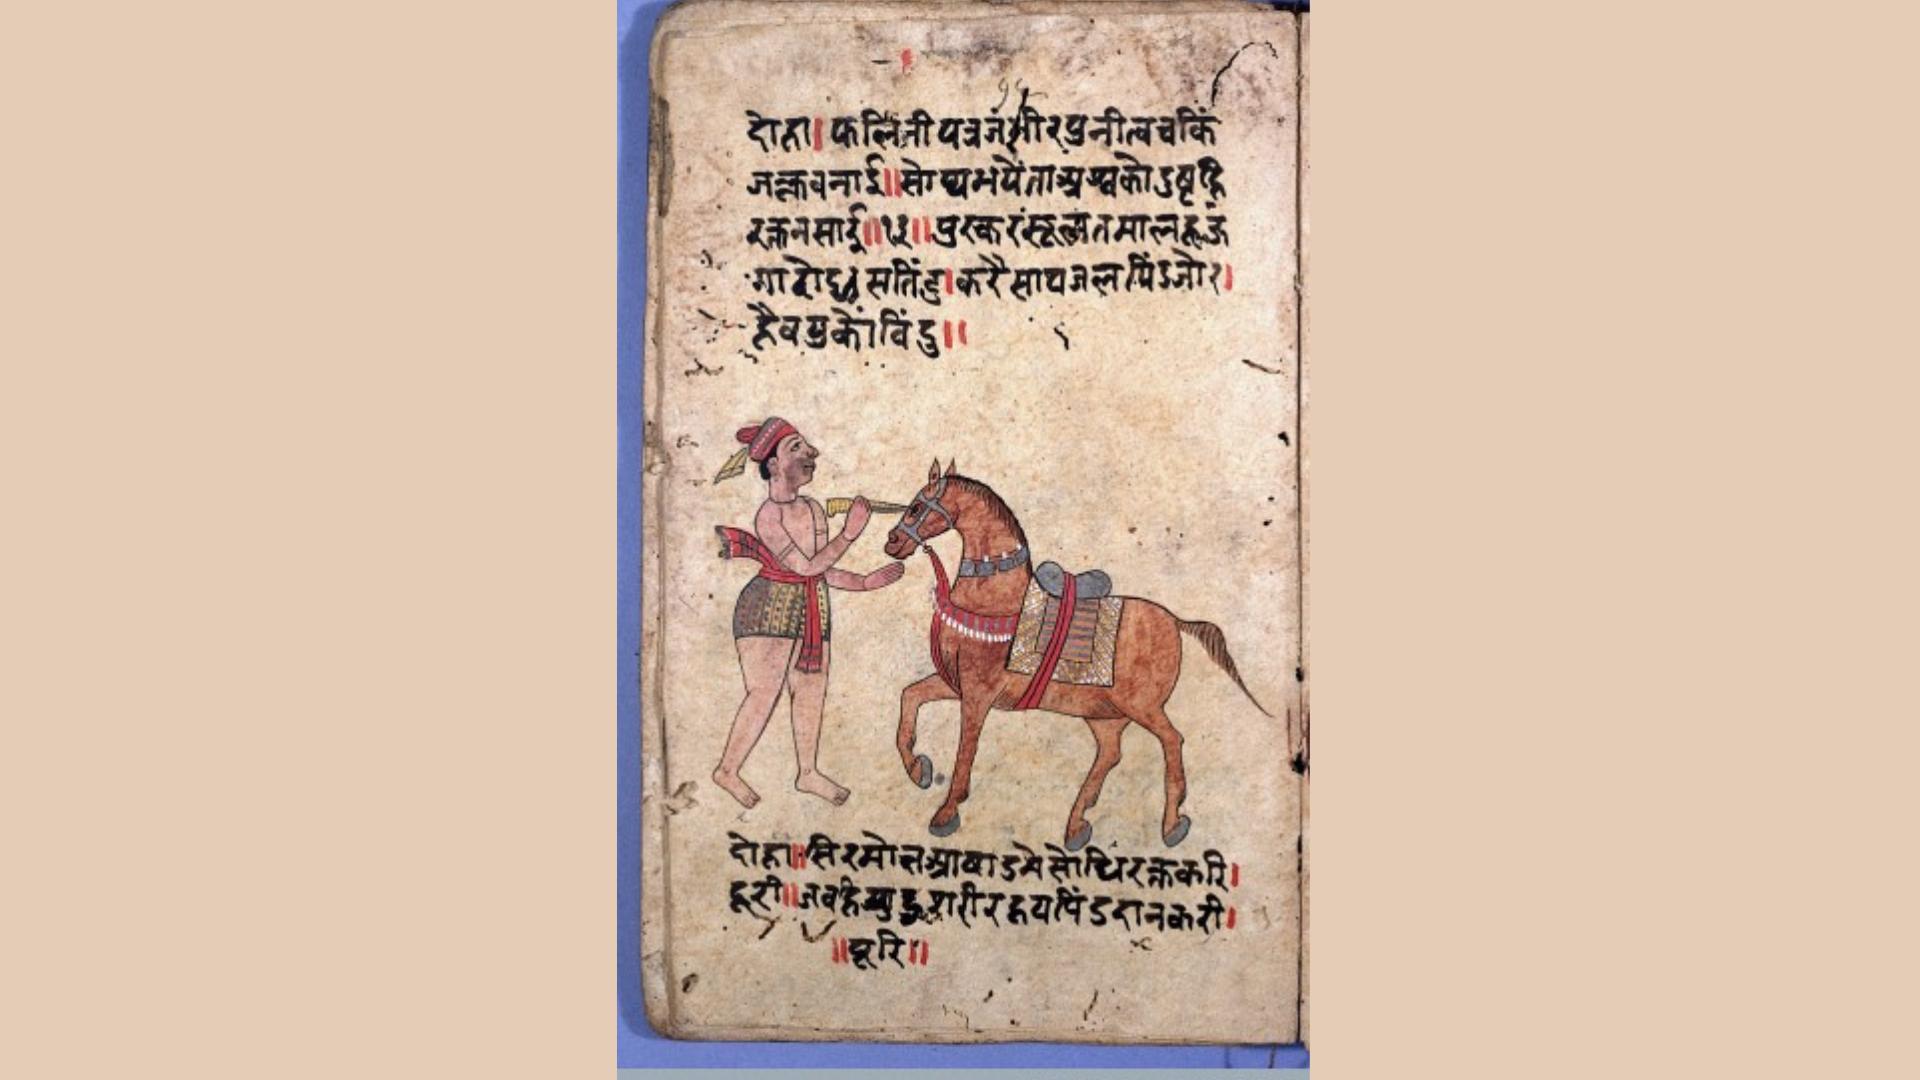 Shalihotra: He Wrote The Book on Horses